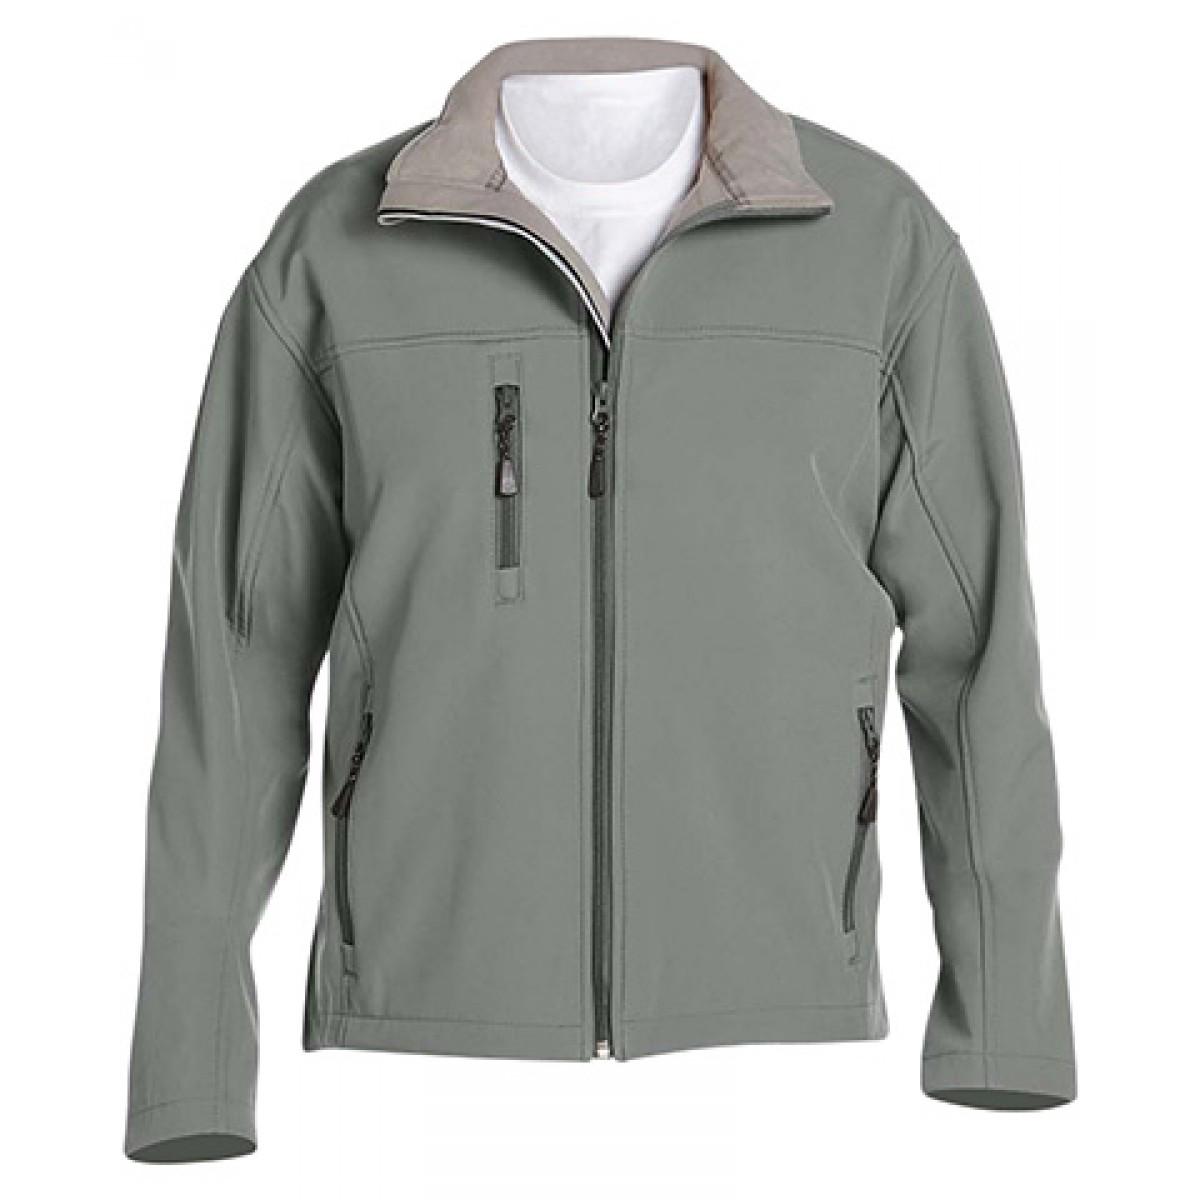 Men's Soft Shell Jacket-Charocal-2XL